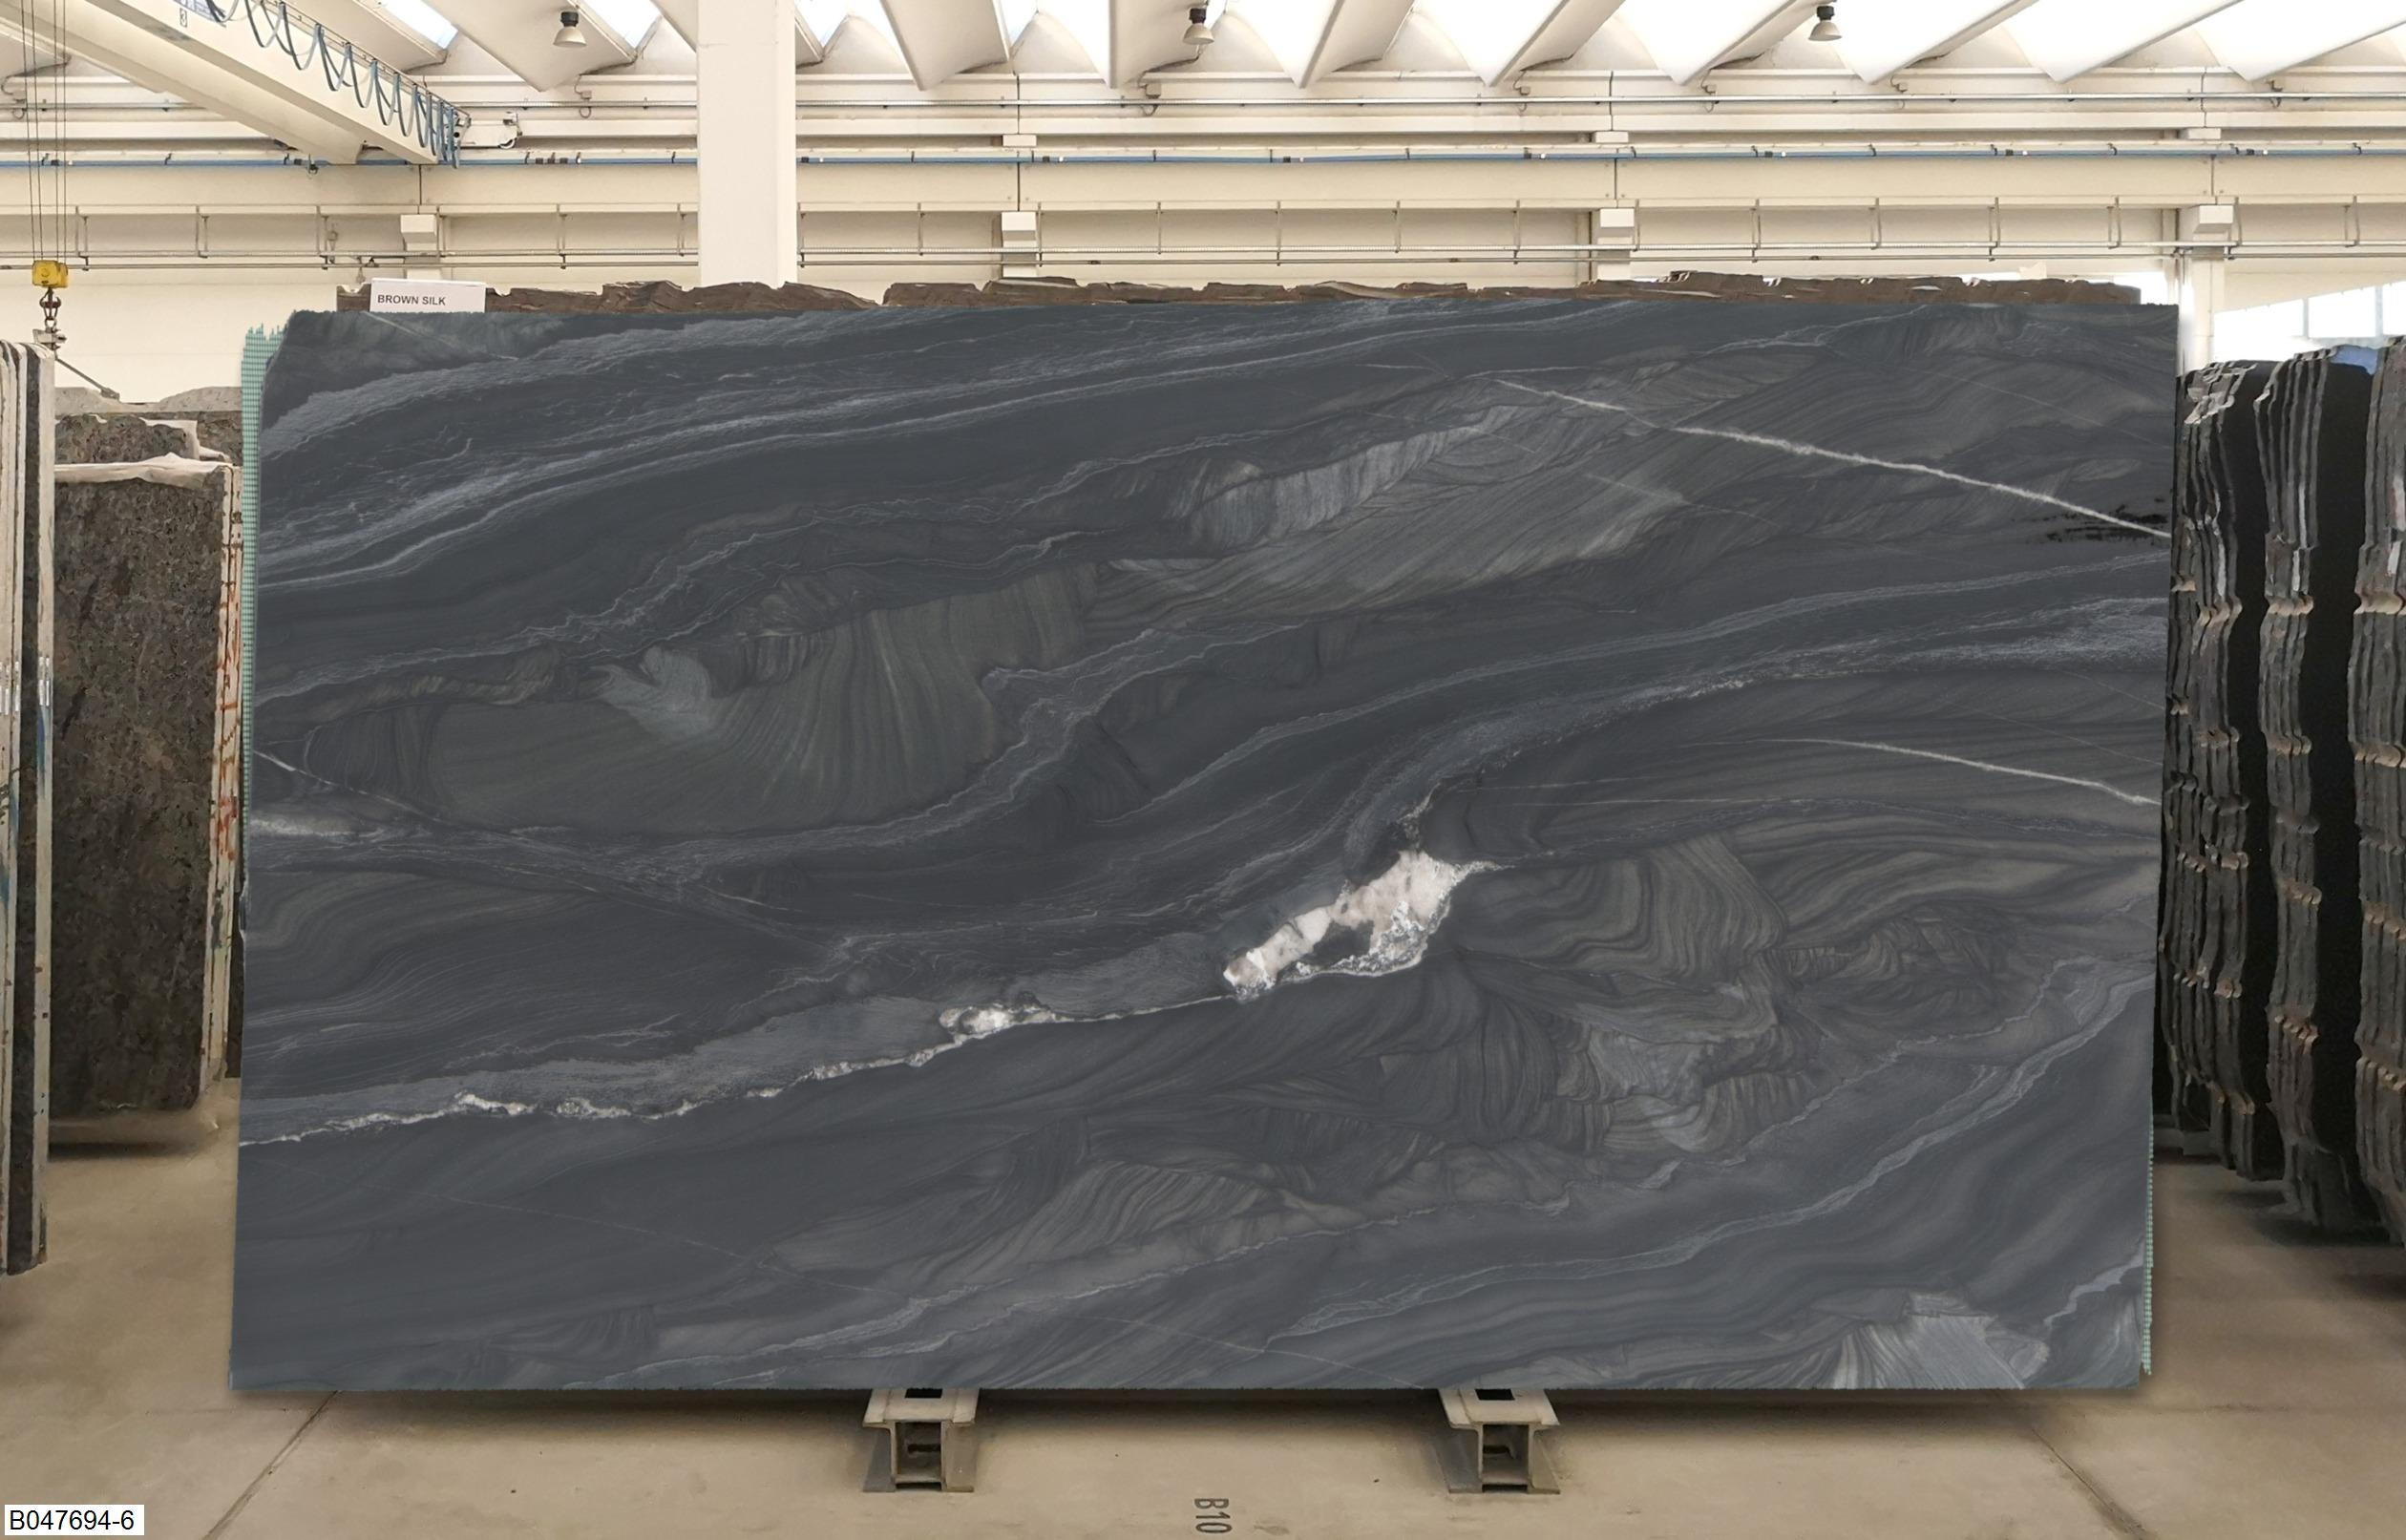 BLACK TEMPEST - LASTRE SATINATE-MACCHIA APERTA Foto: 1_59698_39241.jpg